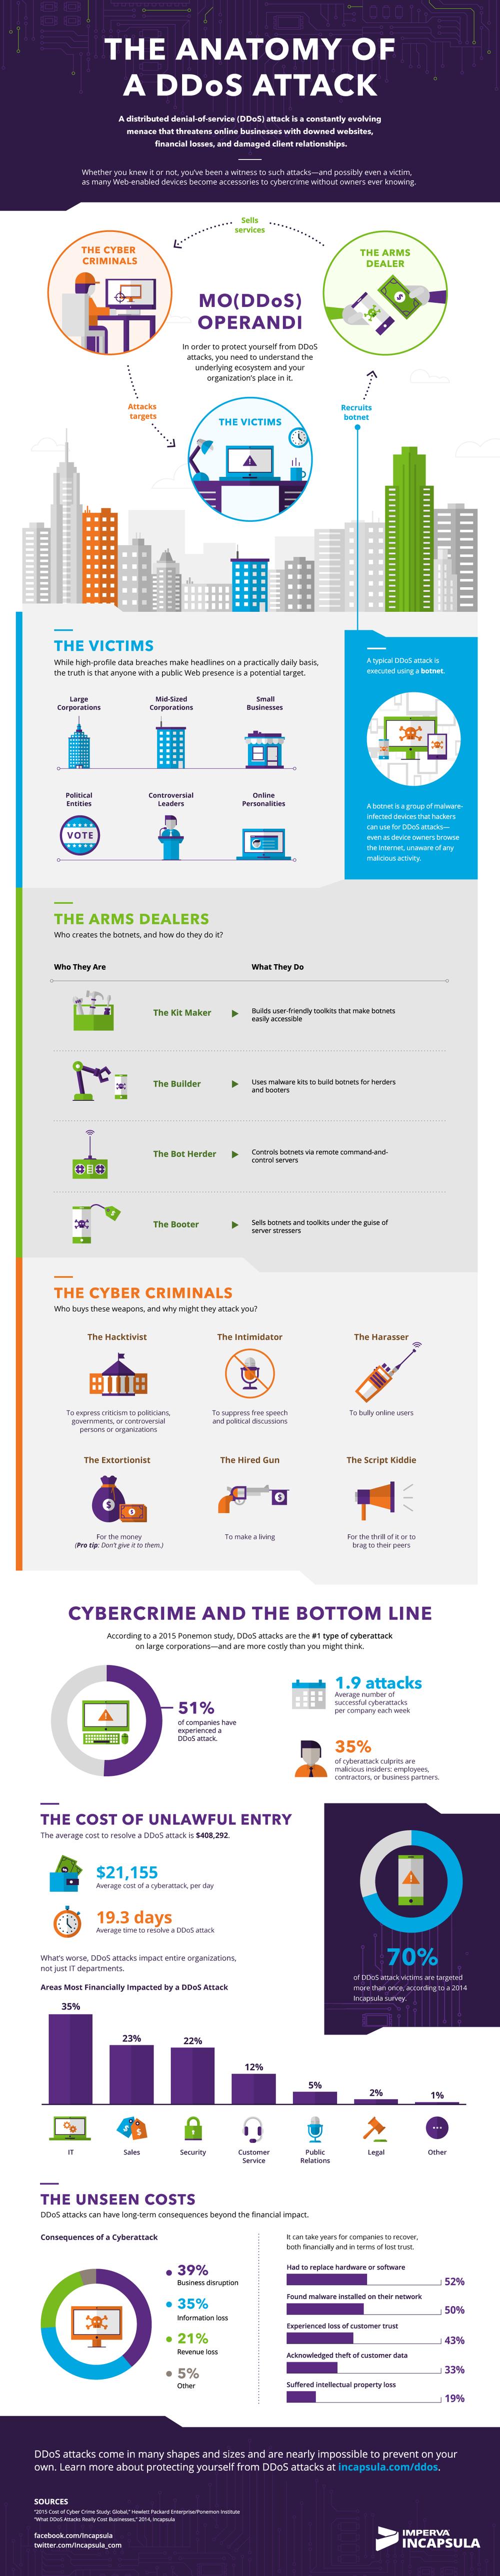 The Anatomy of a DDoS Attack via Column Five